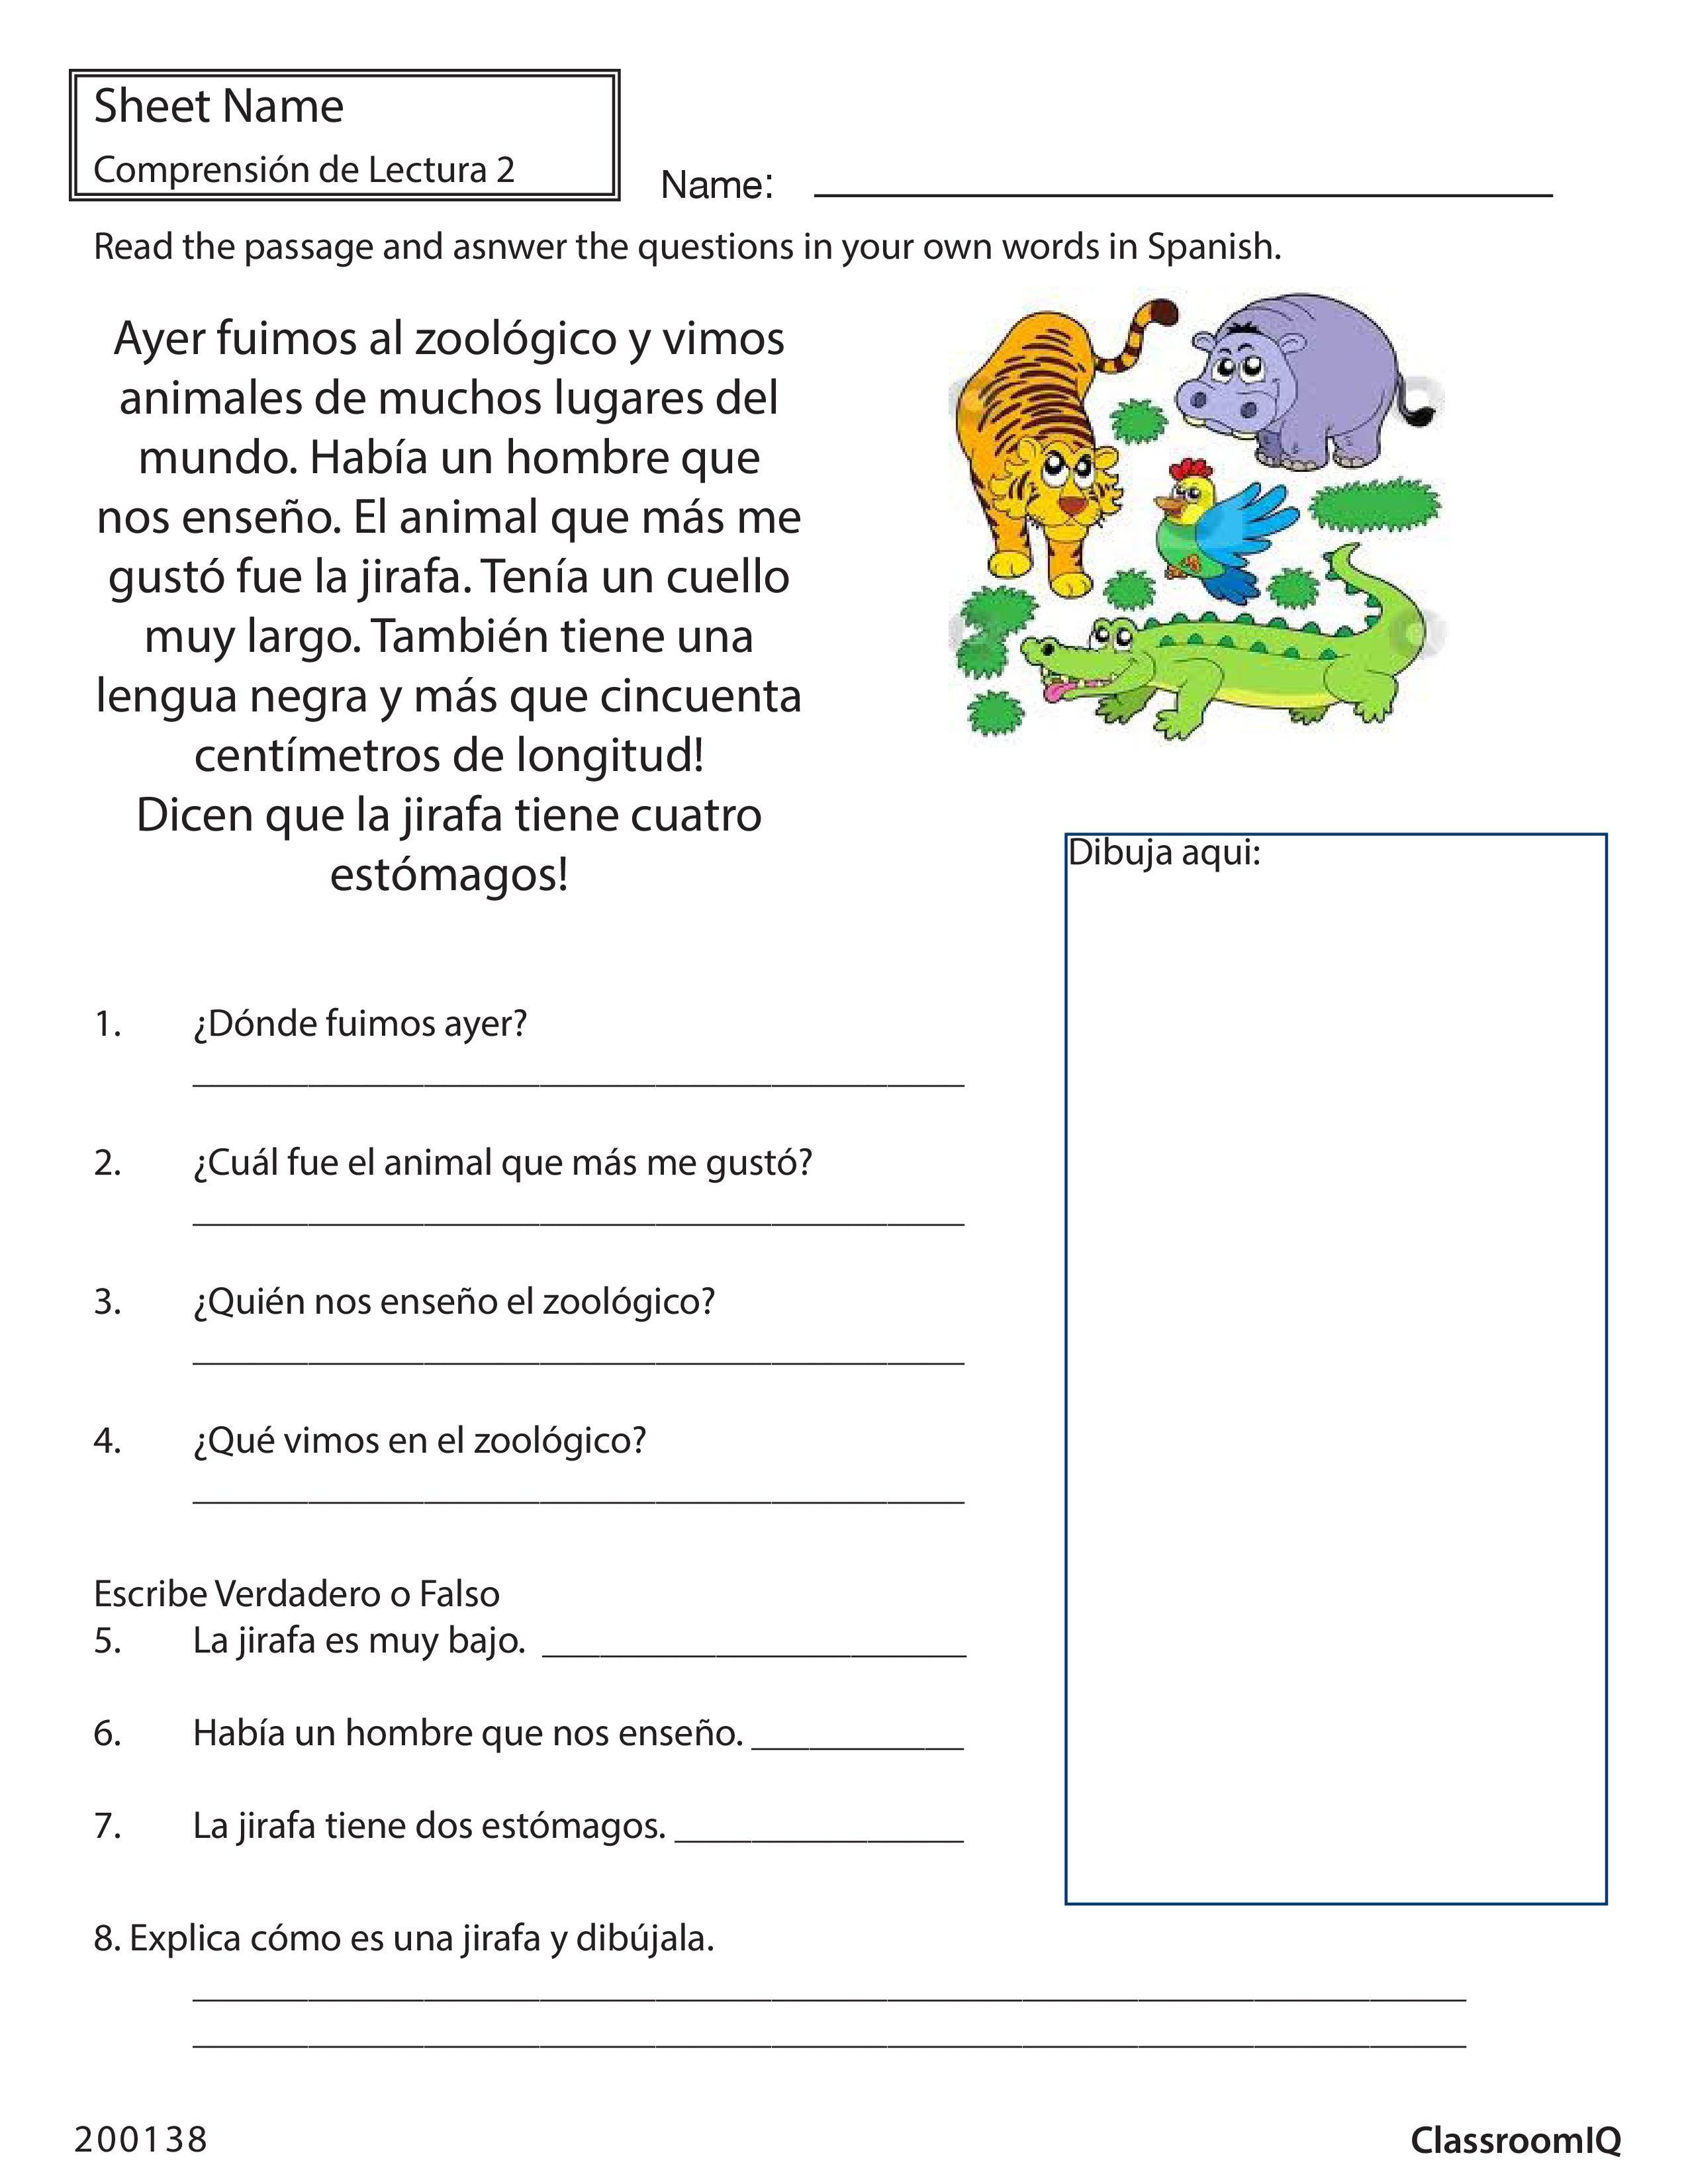 Respond To Passage Zoo Spanishworksheet Newteachers